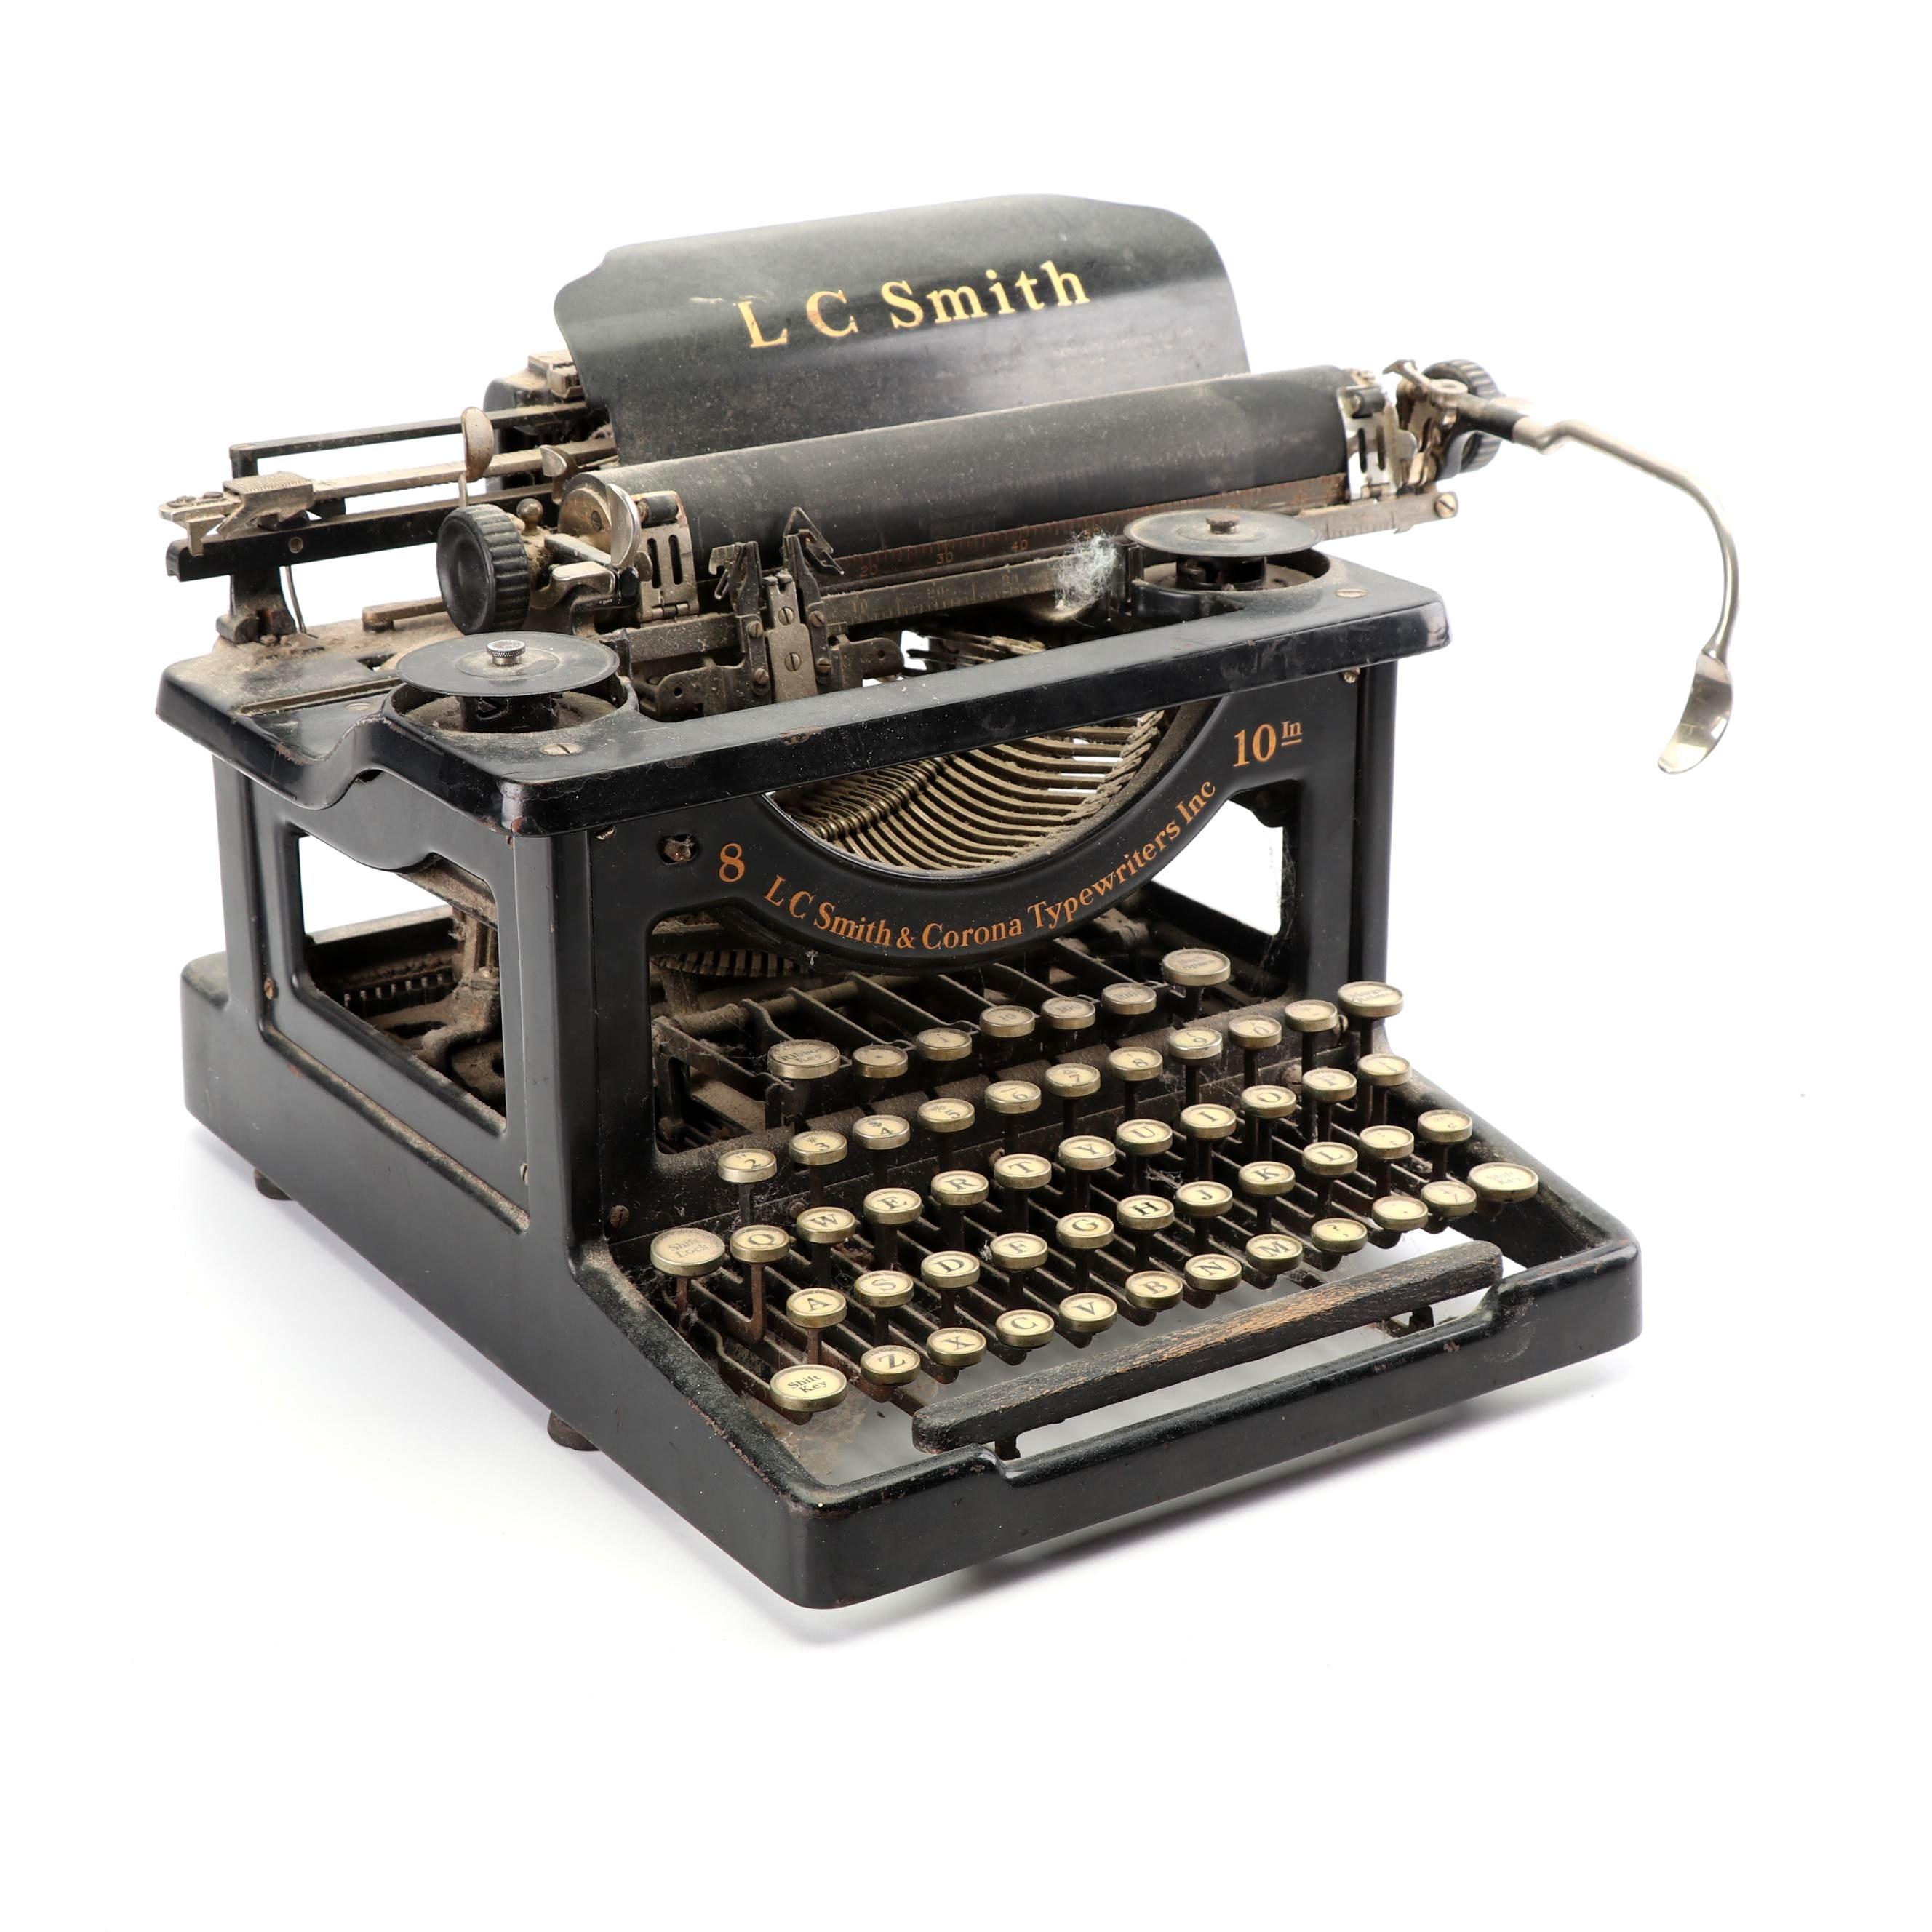 L.C. Smith & Corona Inc. No. 8 Typewriter, Circa 1920s